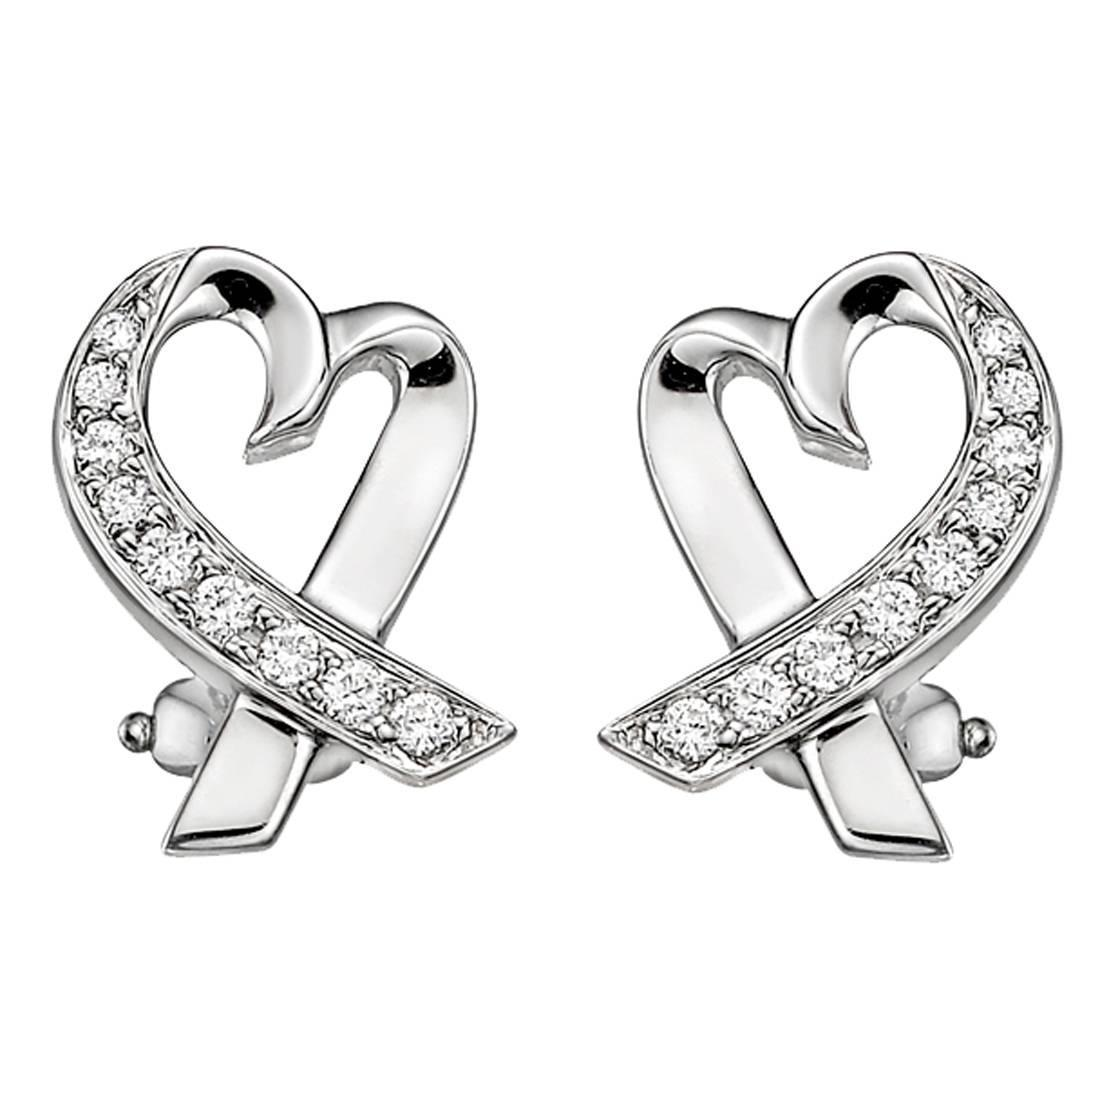 Diamond heart earrings -  Paloma Picasso Diamond Gold Loving Heart Earrings At 1stdibs